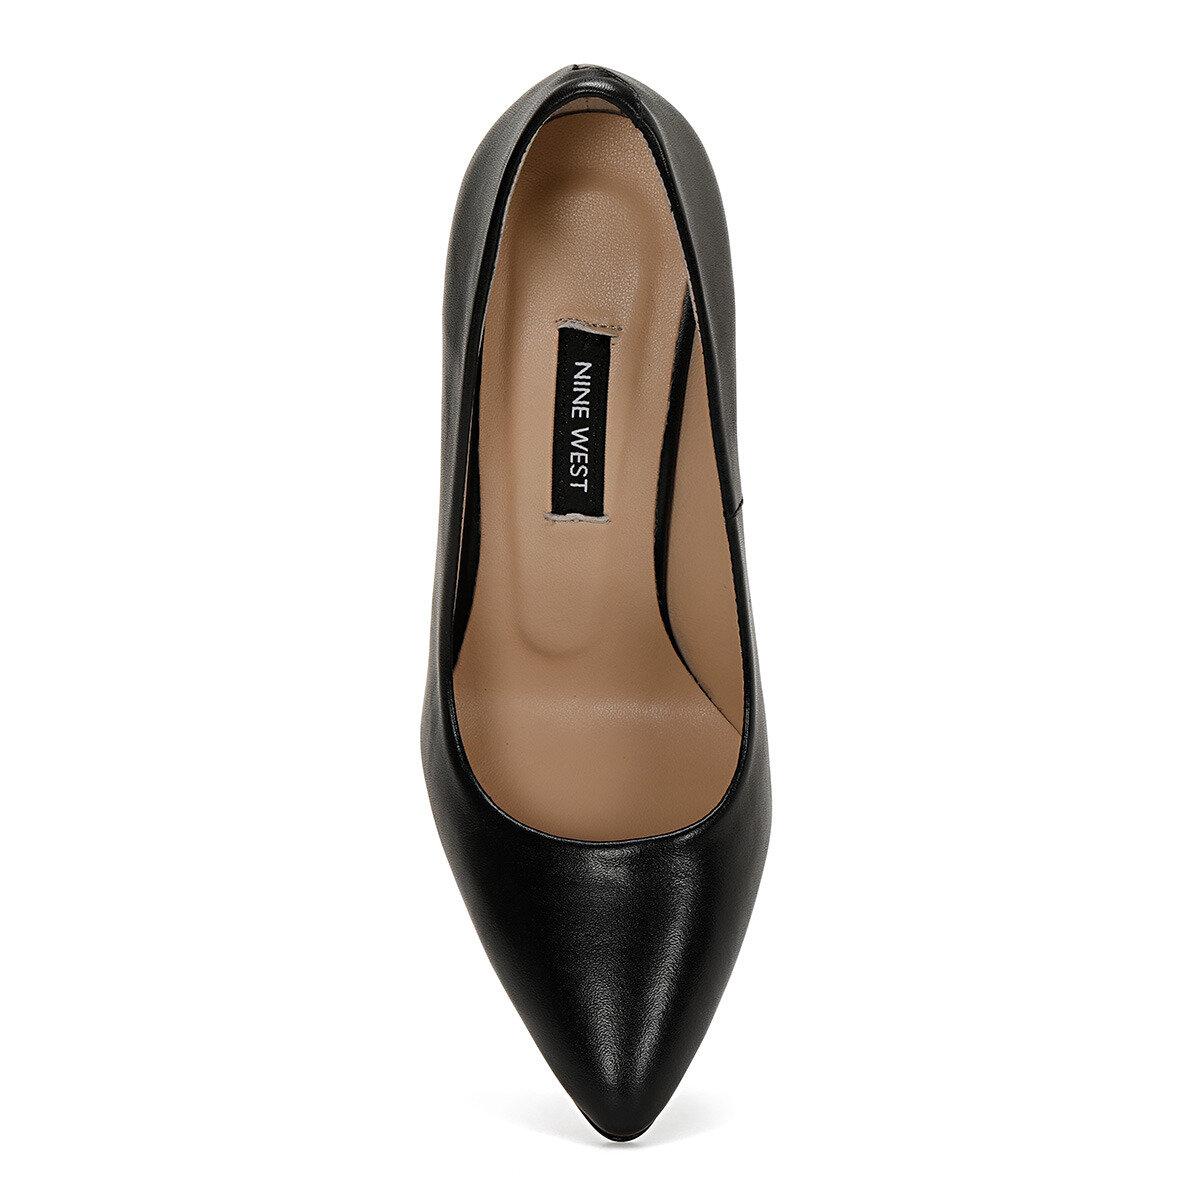 FRONTA Siyah Kadın Stiletto